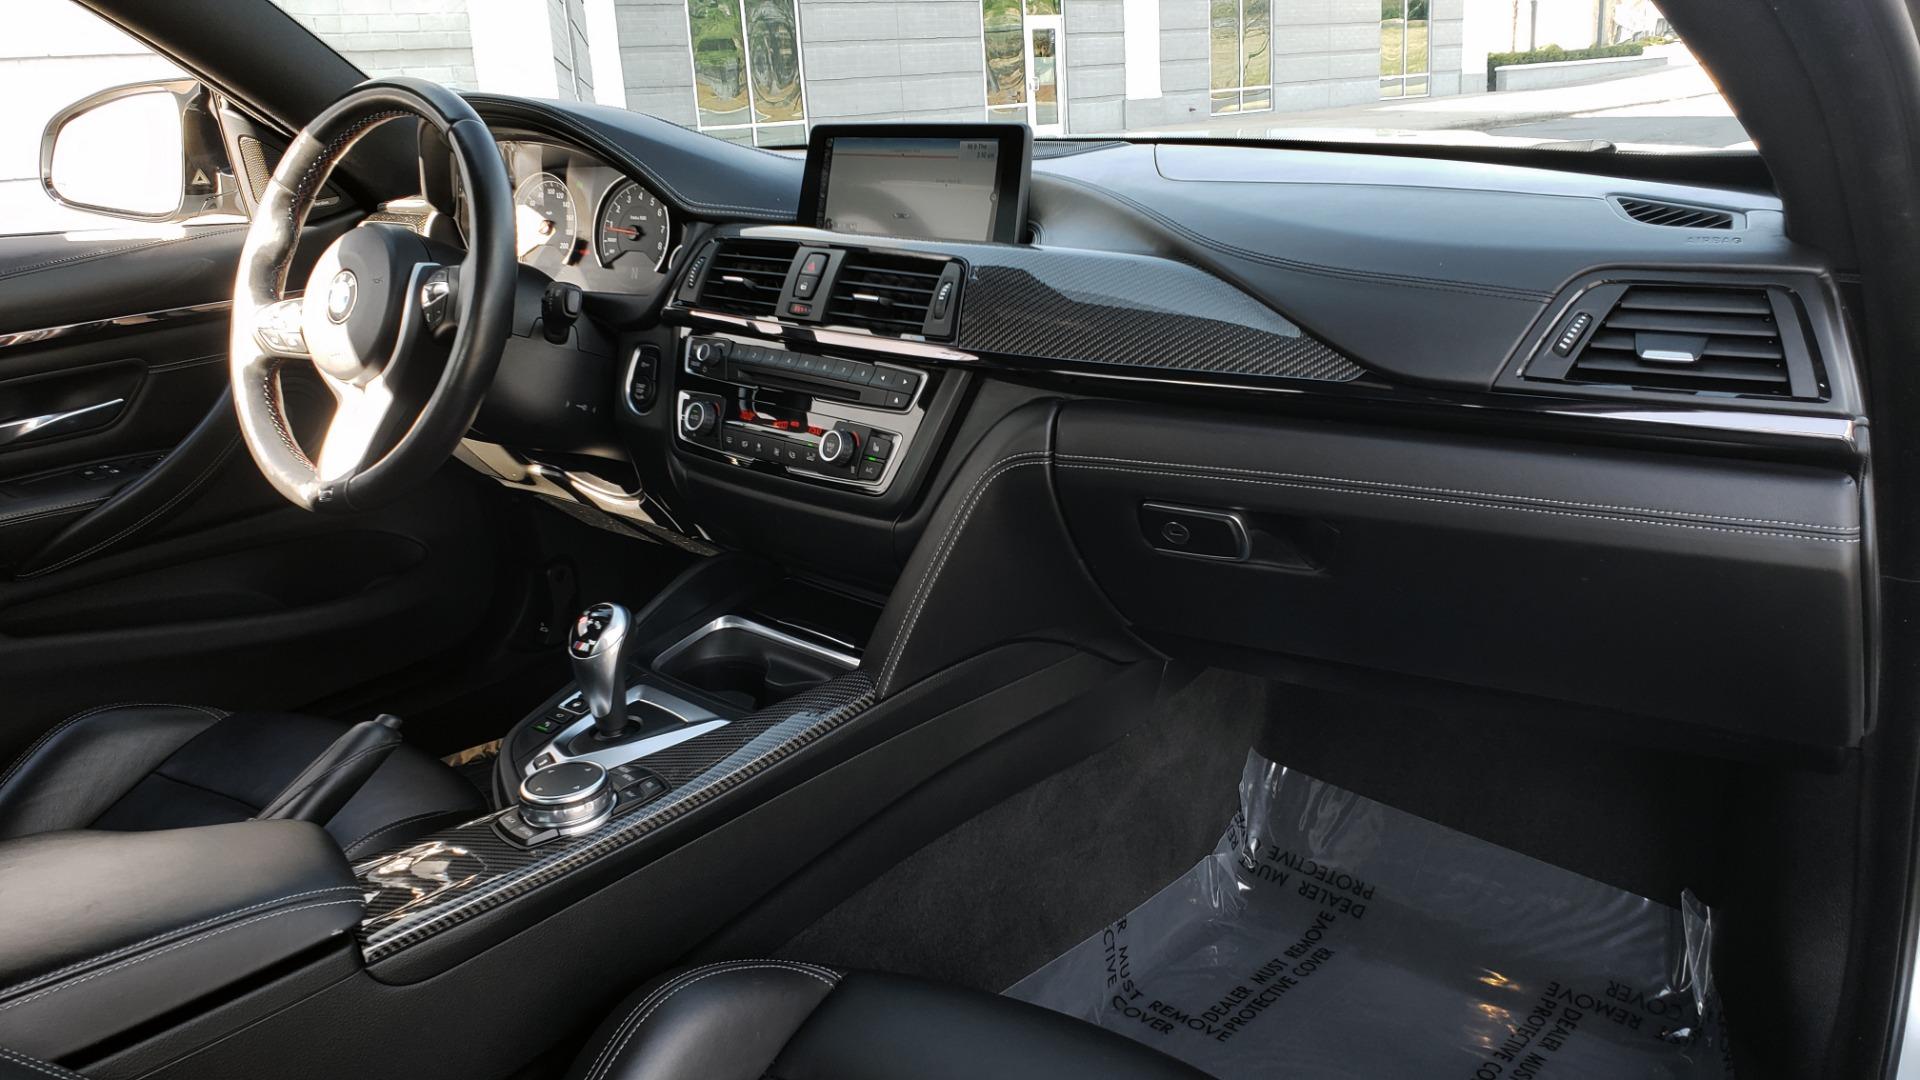 Used 2015 BMW M4 COUPE / EXEC PKG / DRVR ASST PLUS / LIGHTING / M-SUSPENSION for sale Sold at Formula Imports in Charlotte NC 28227 78